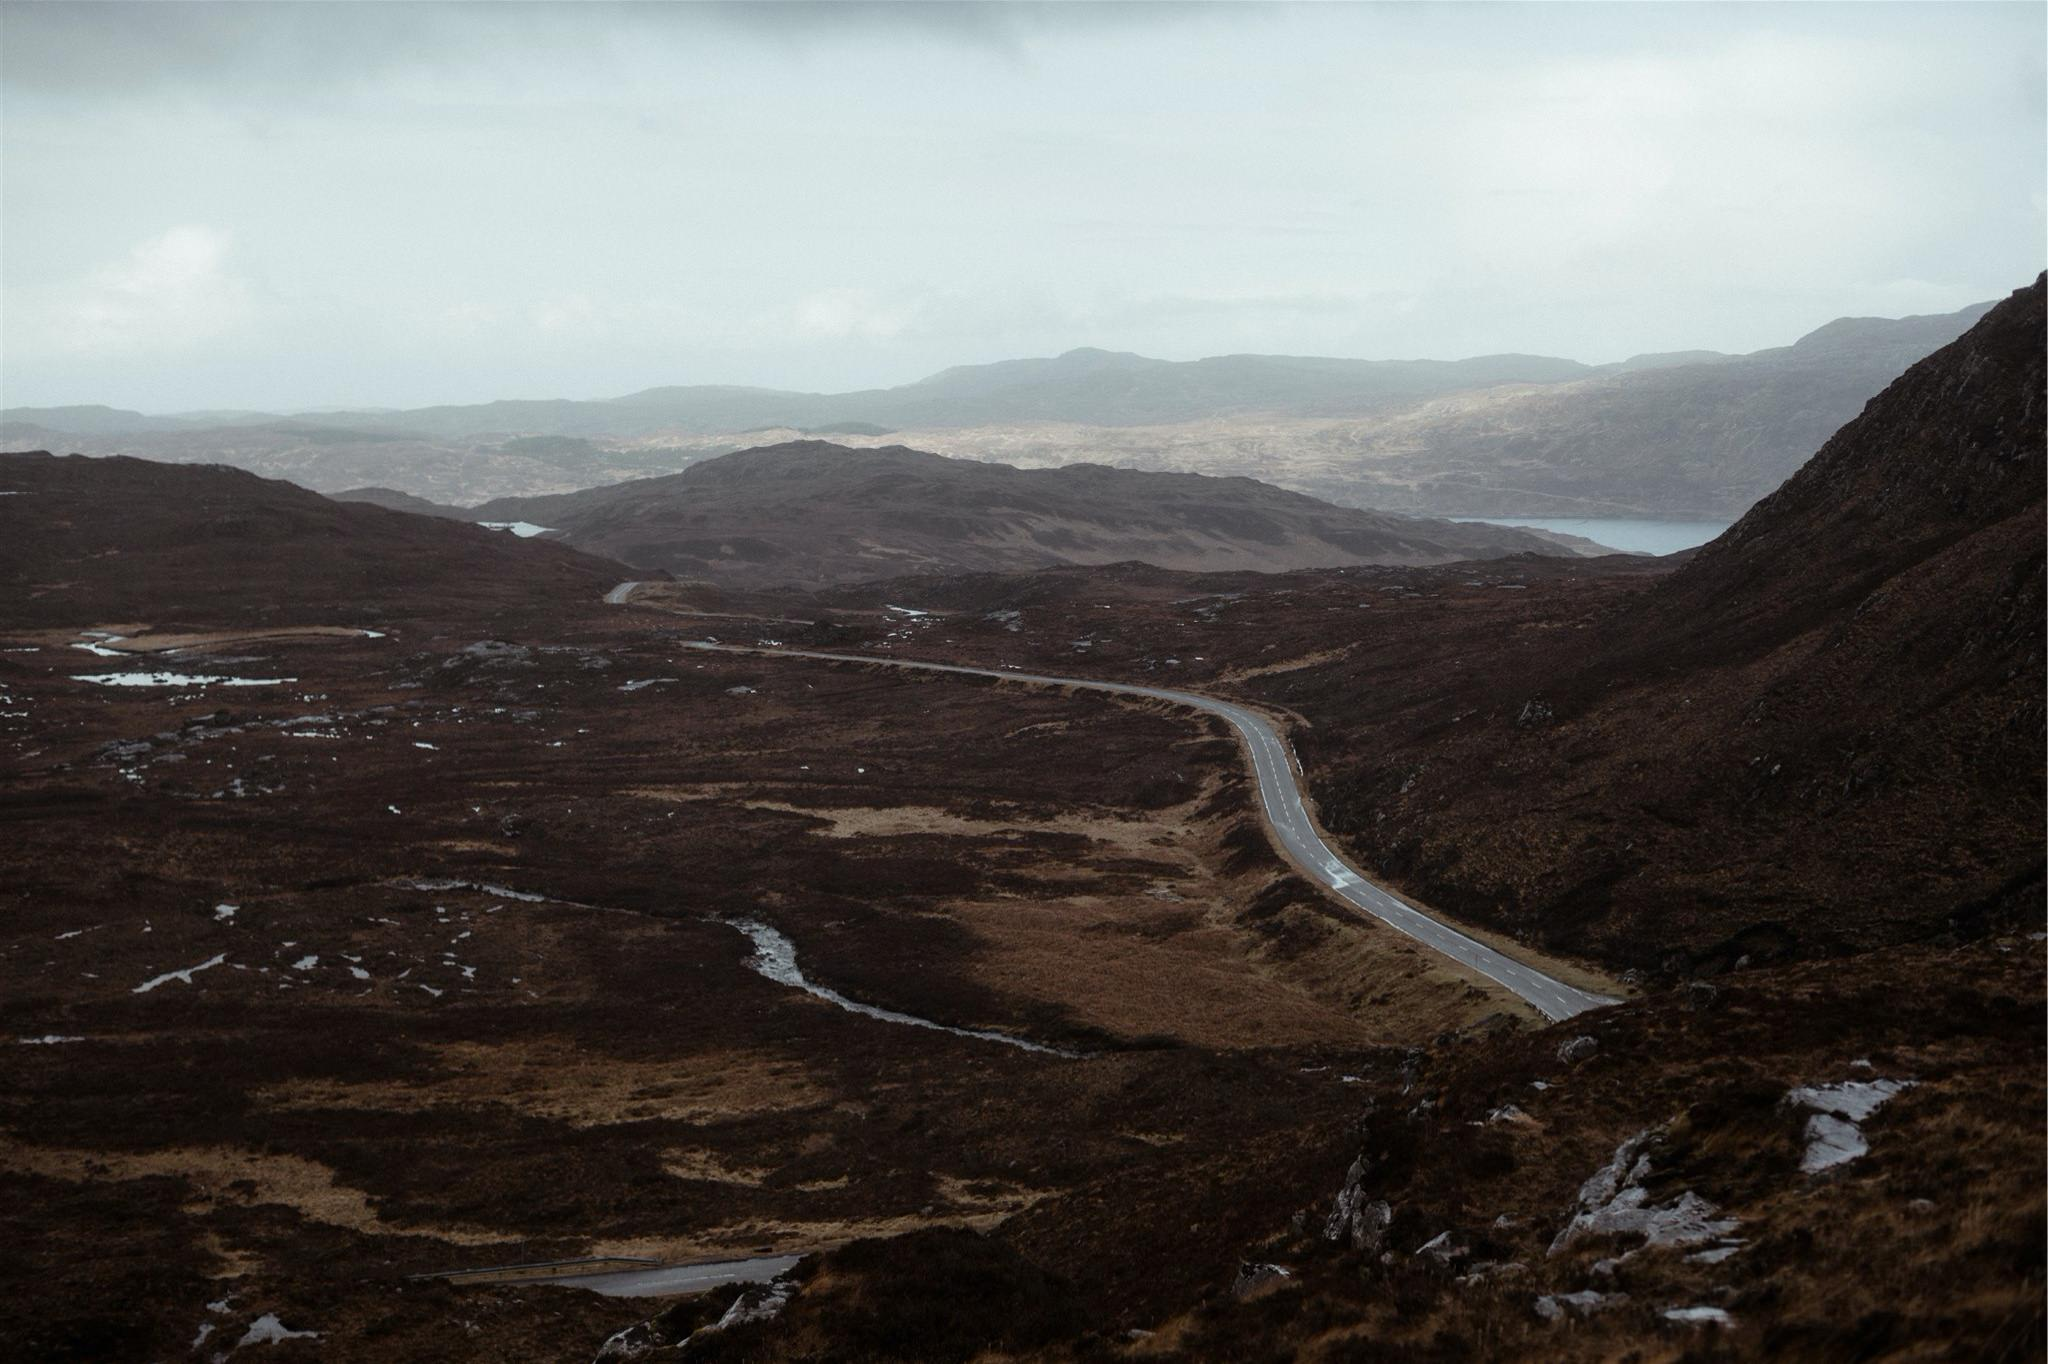 Road through the mountains in Assynt, Scotland